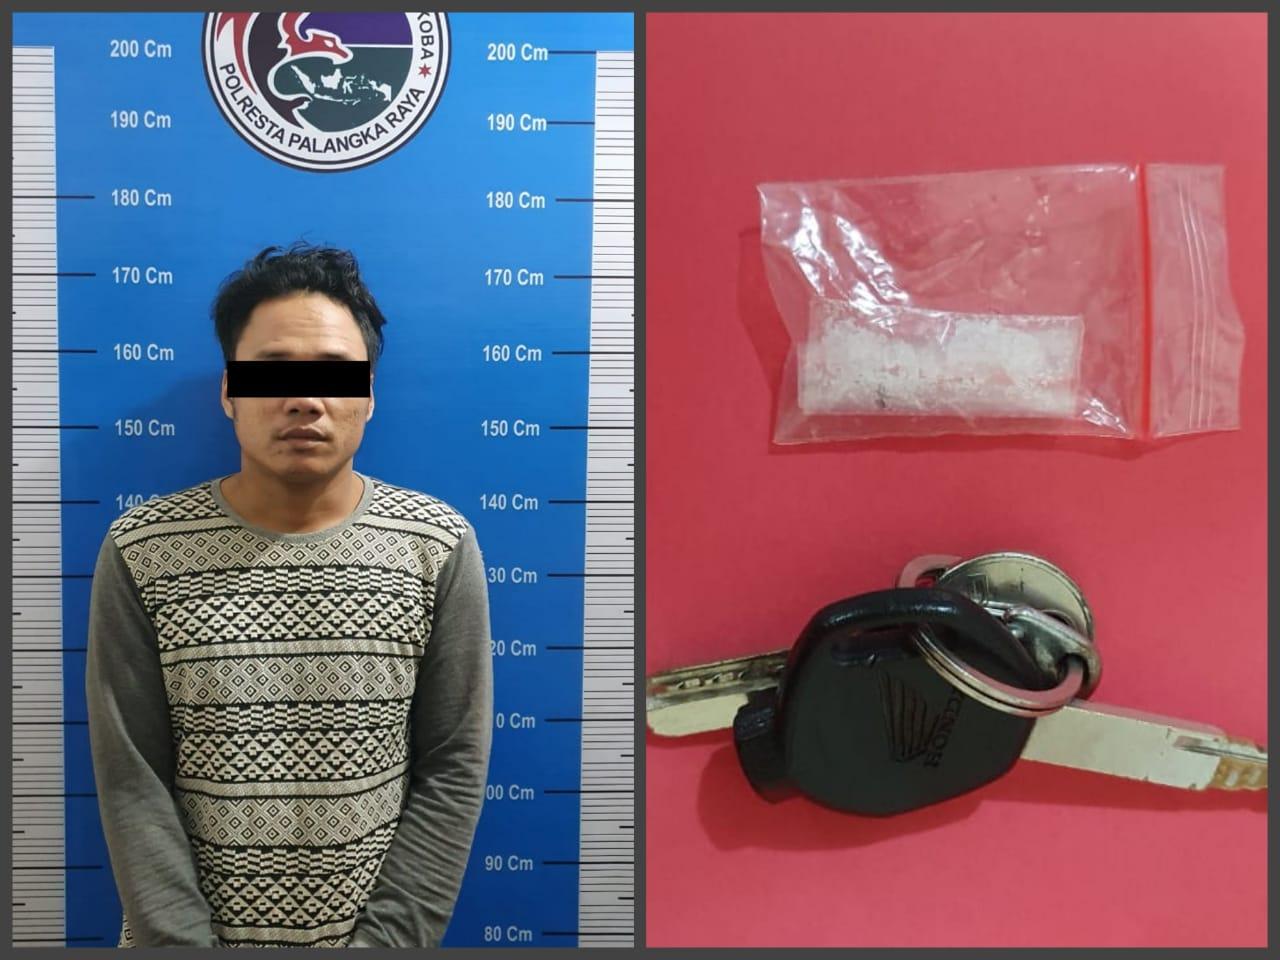 Seorang Pria Diringkus Satresnarkoba Polresta Palangka Raya, Bawa Barang Haram Sabu 0.45 Gram